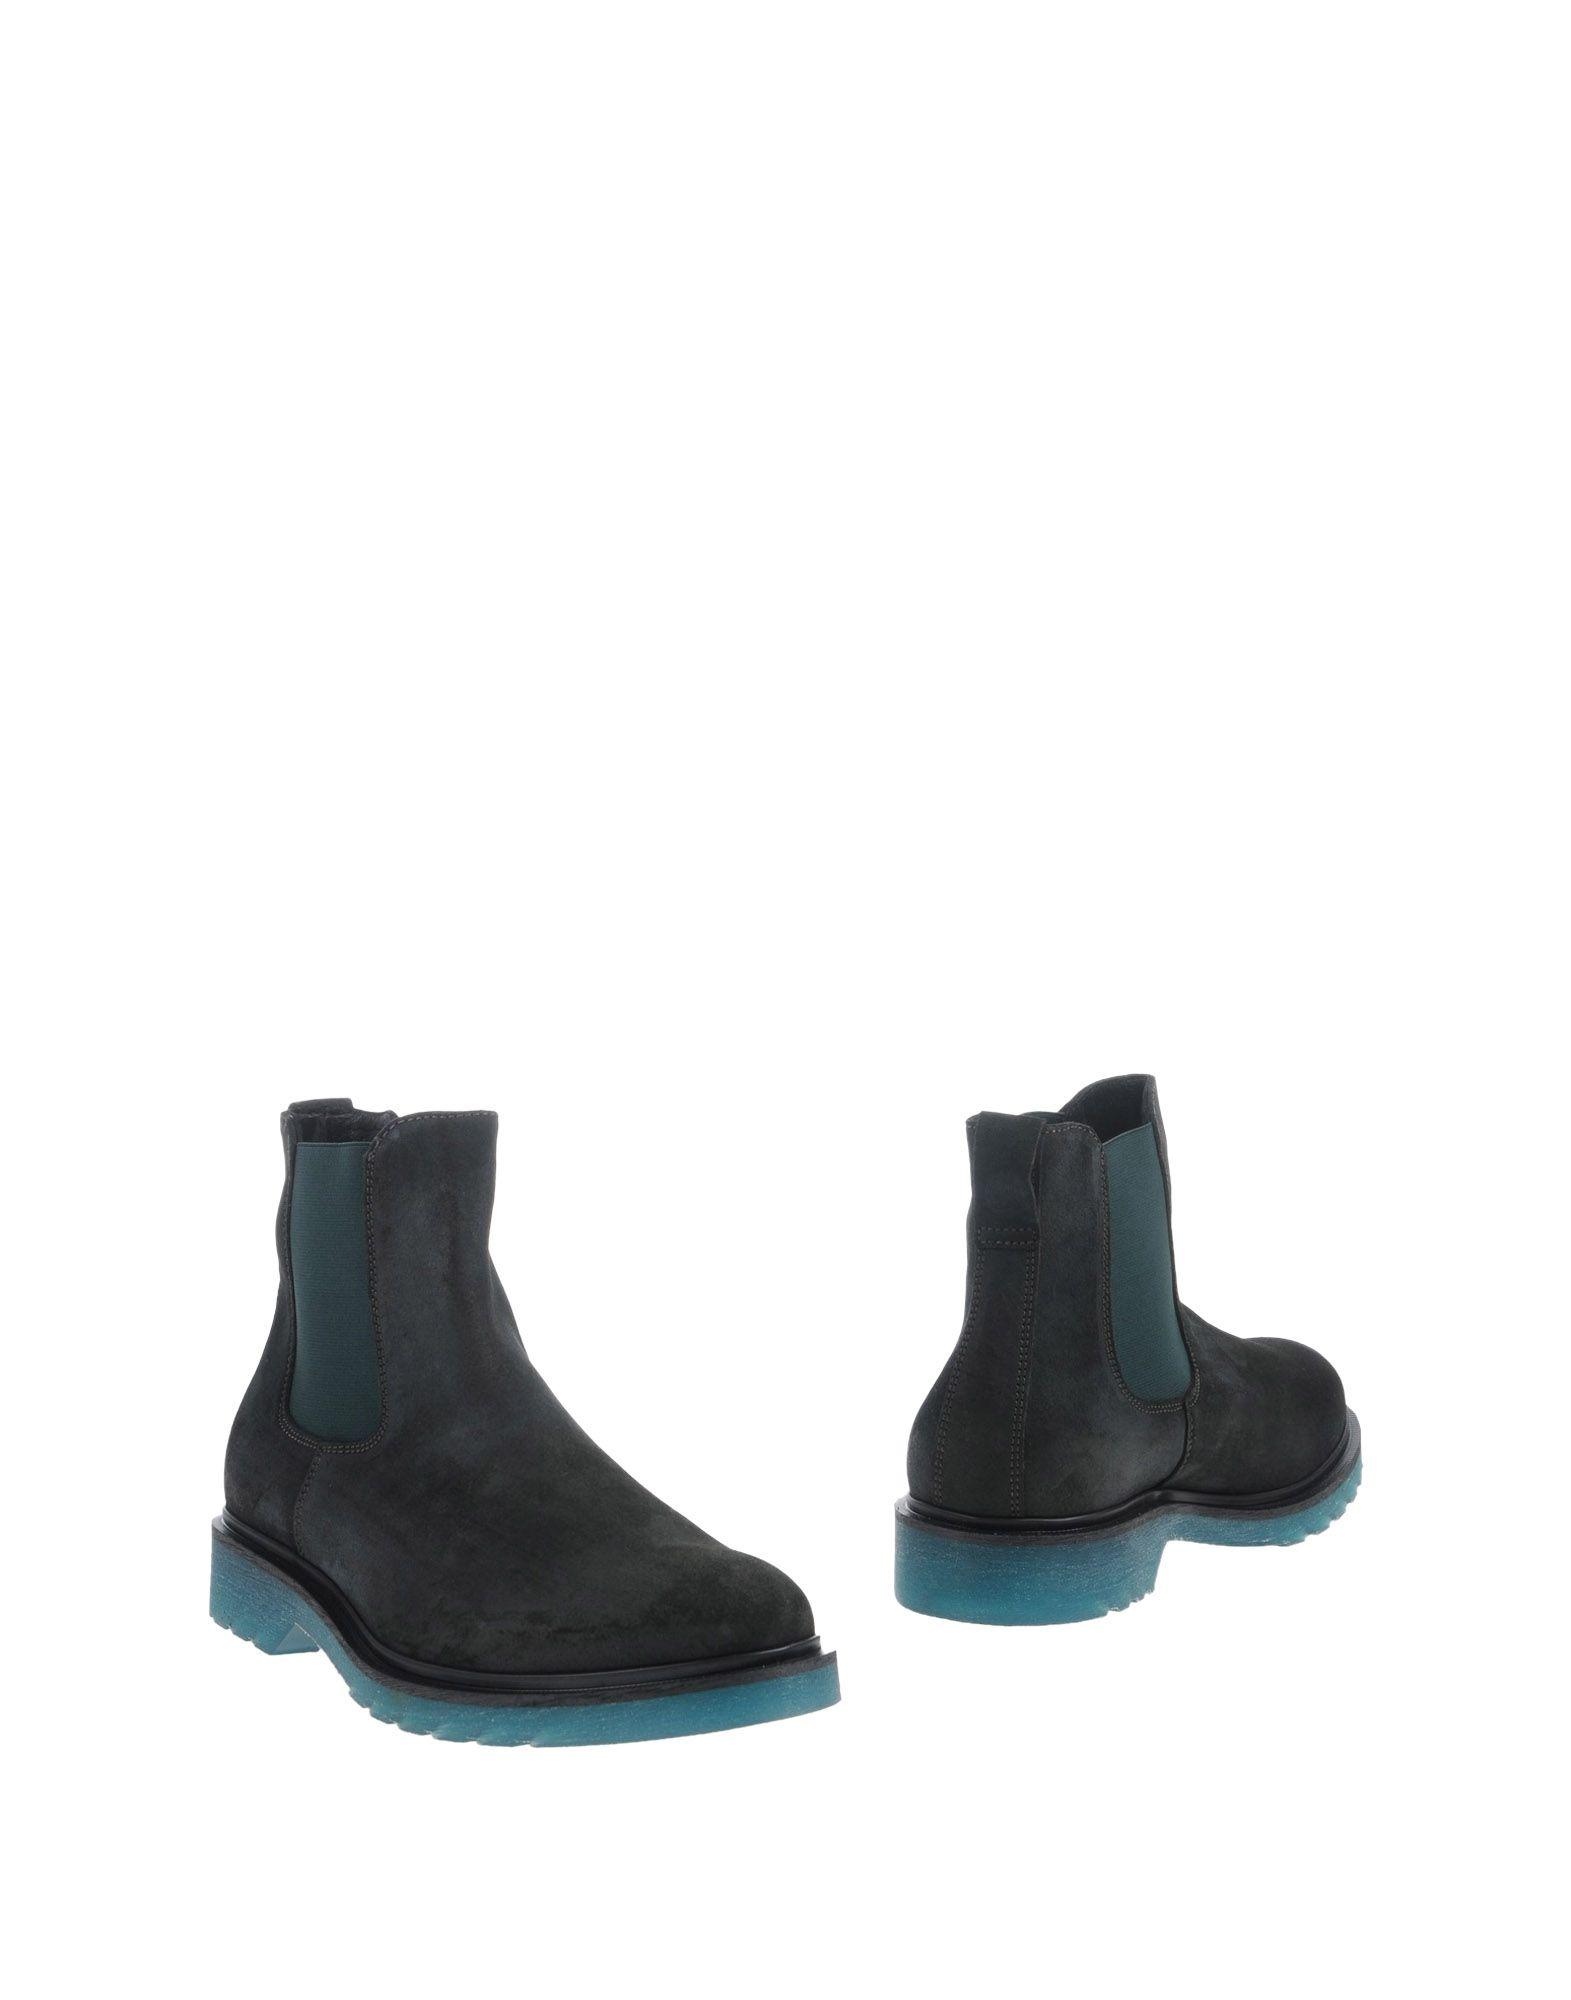 Rabatt Schuhe echte Schuhe Rabatt Rue 51 Stiefelette Herren  11229294GD de8e61